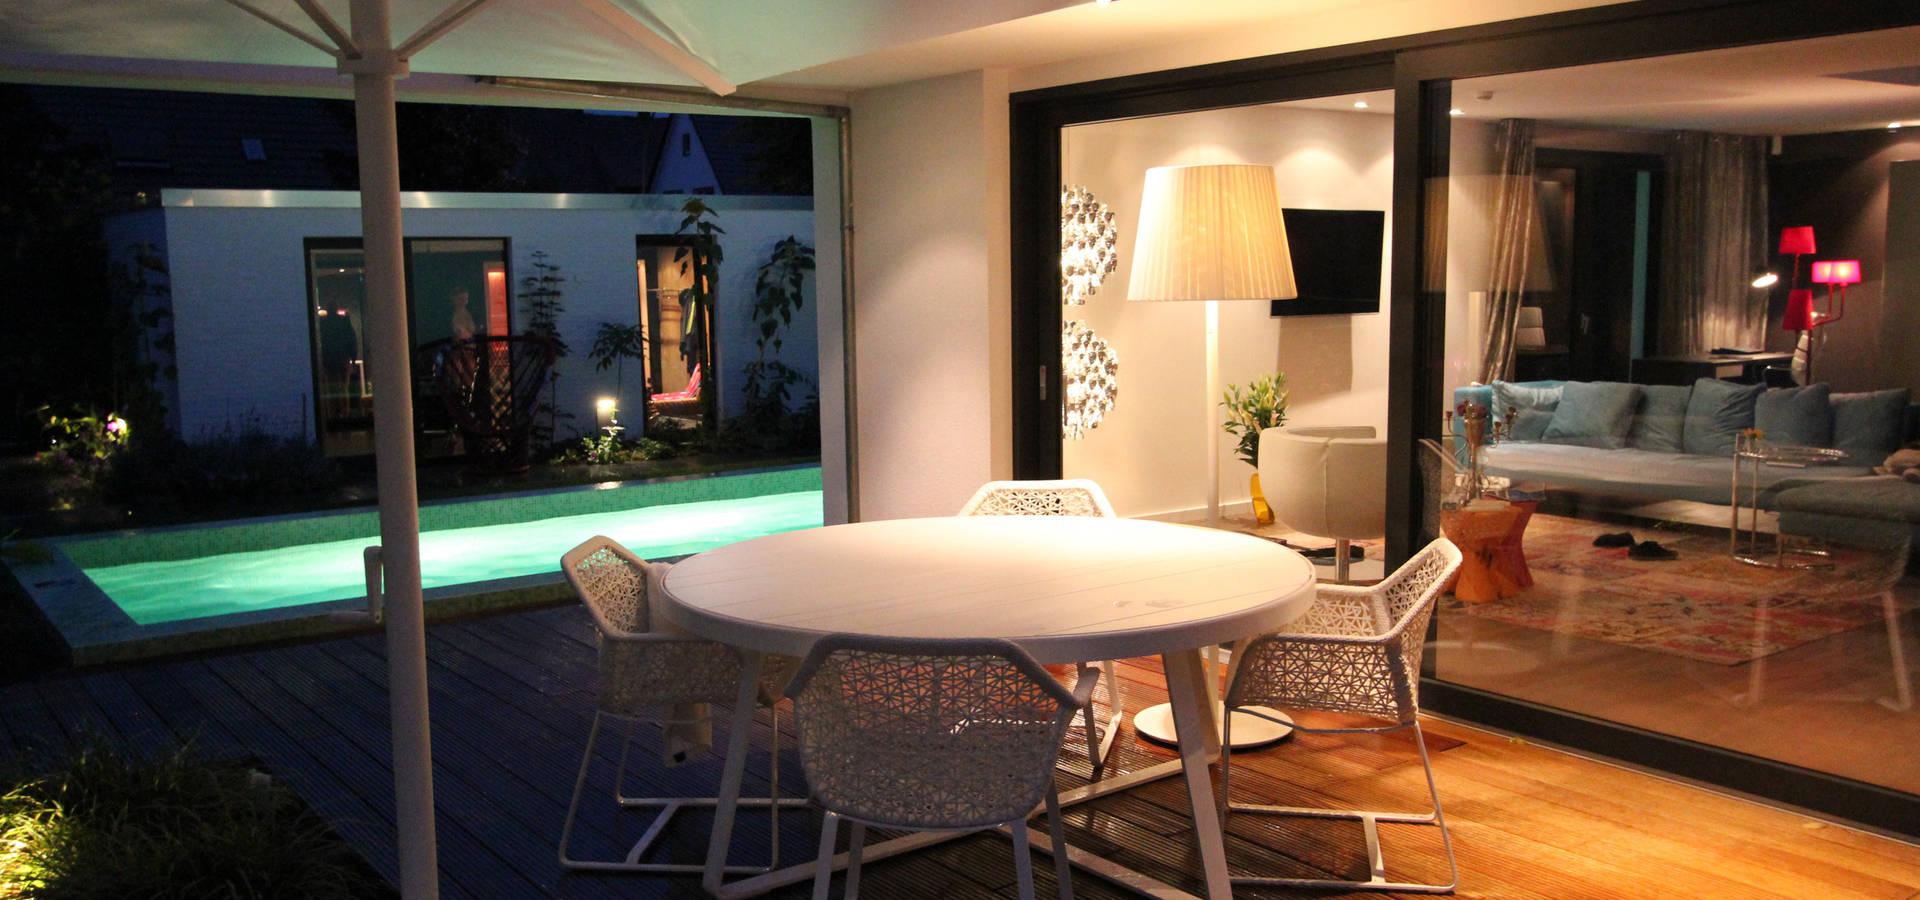 Kitzig Interior Design GmbH